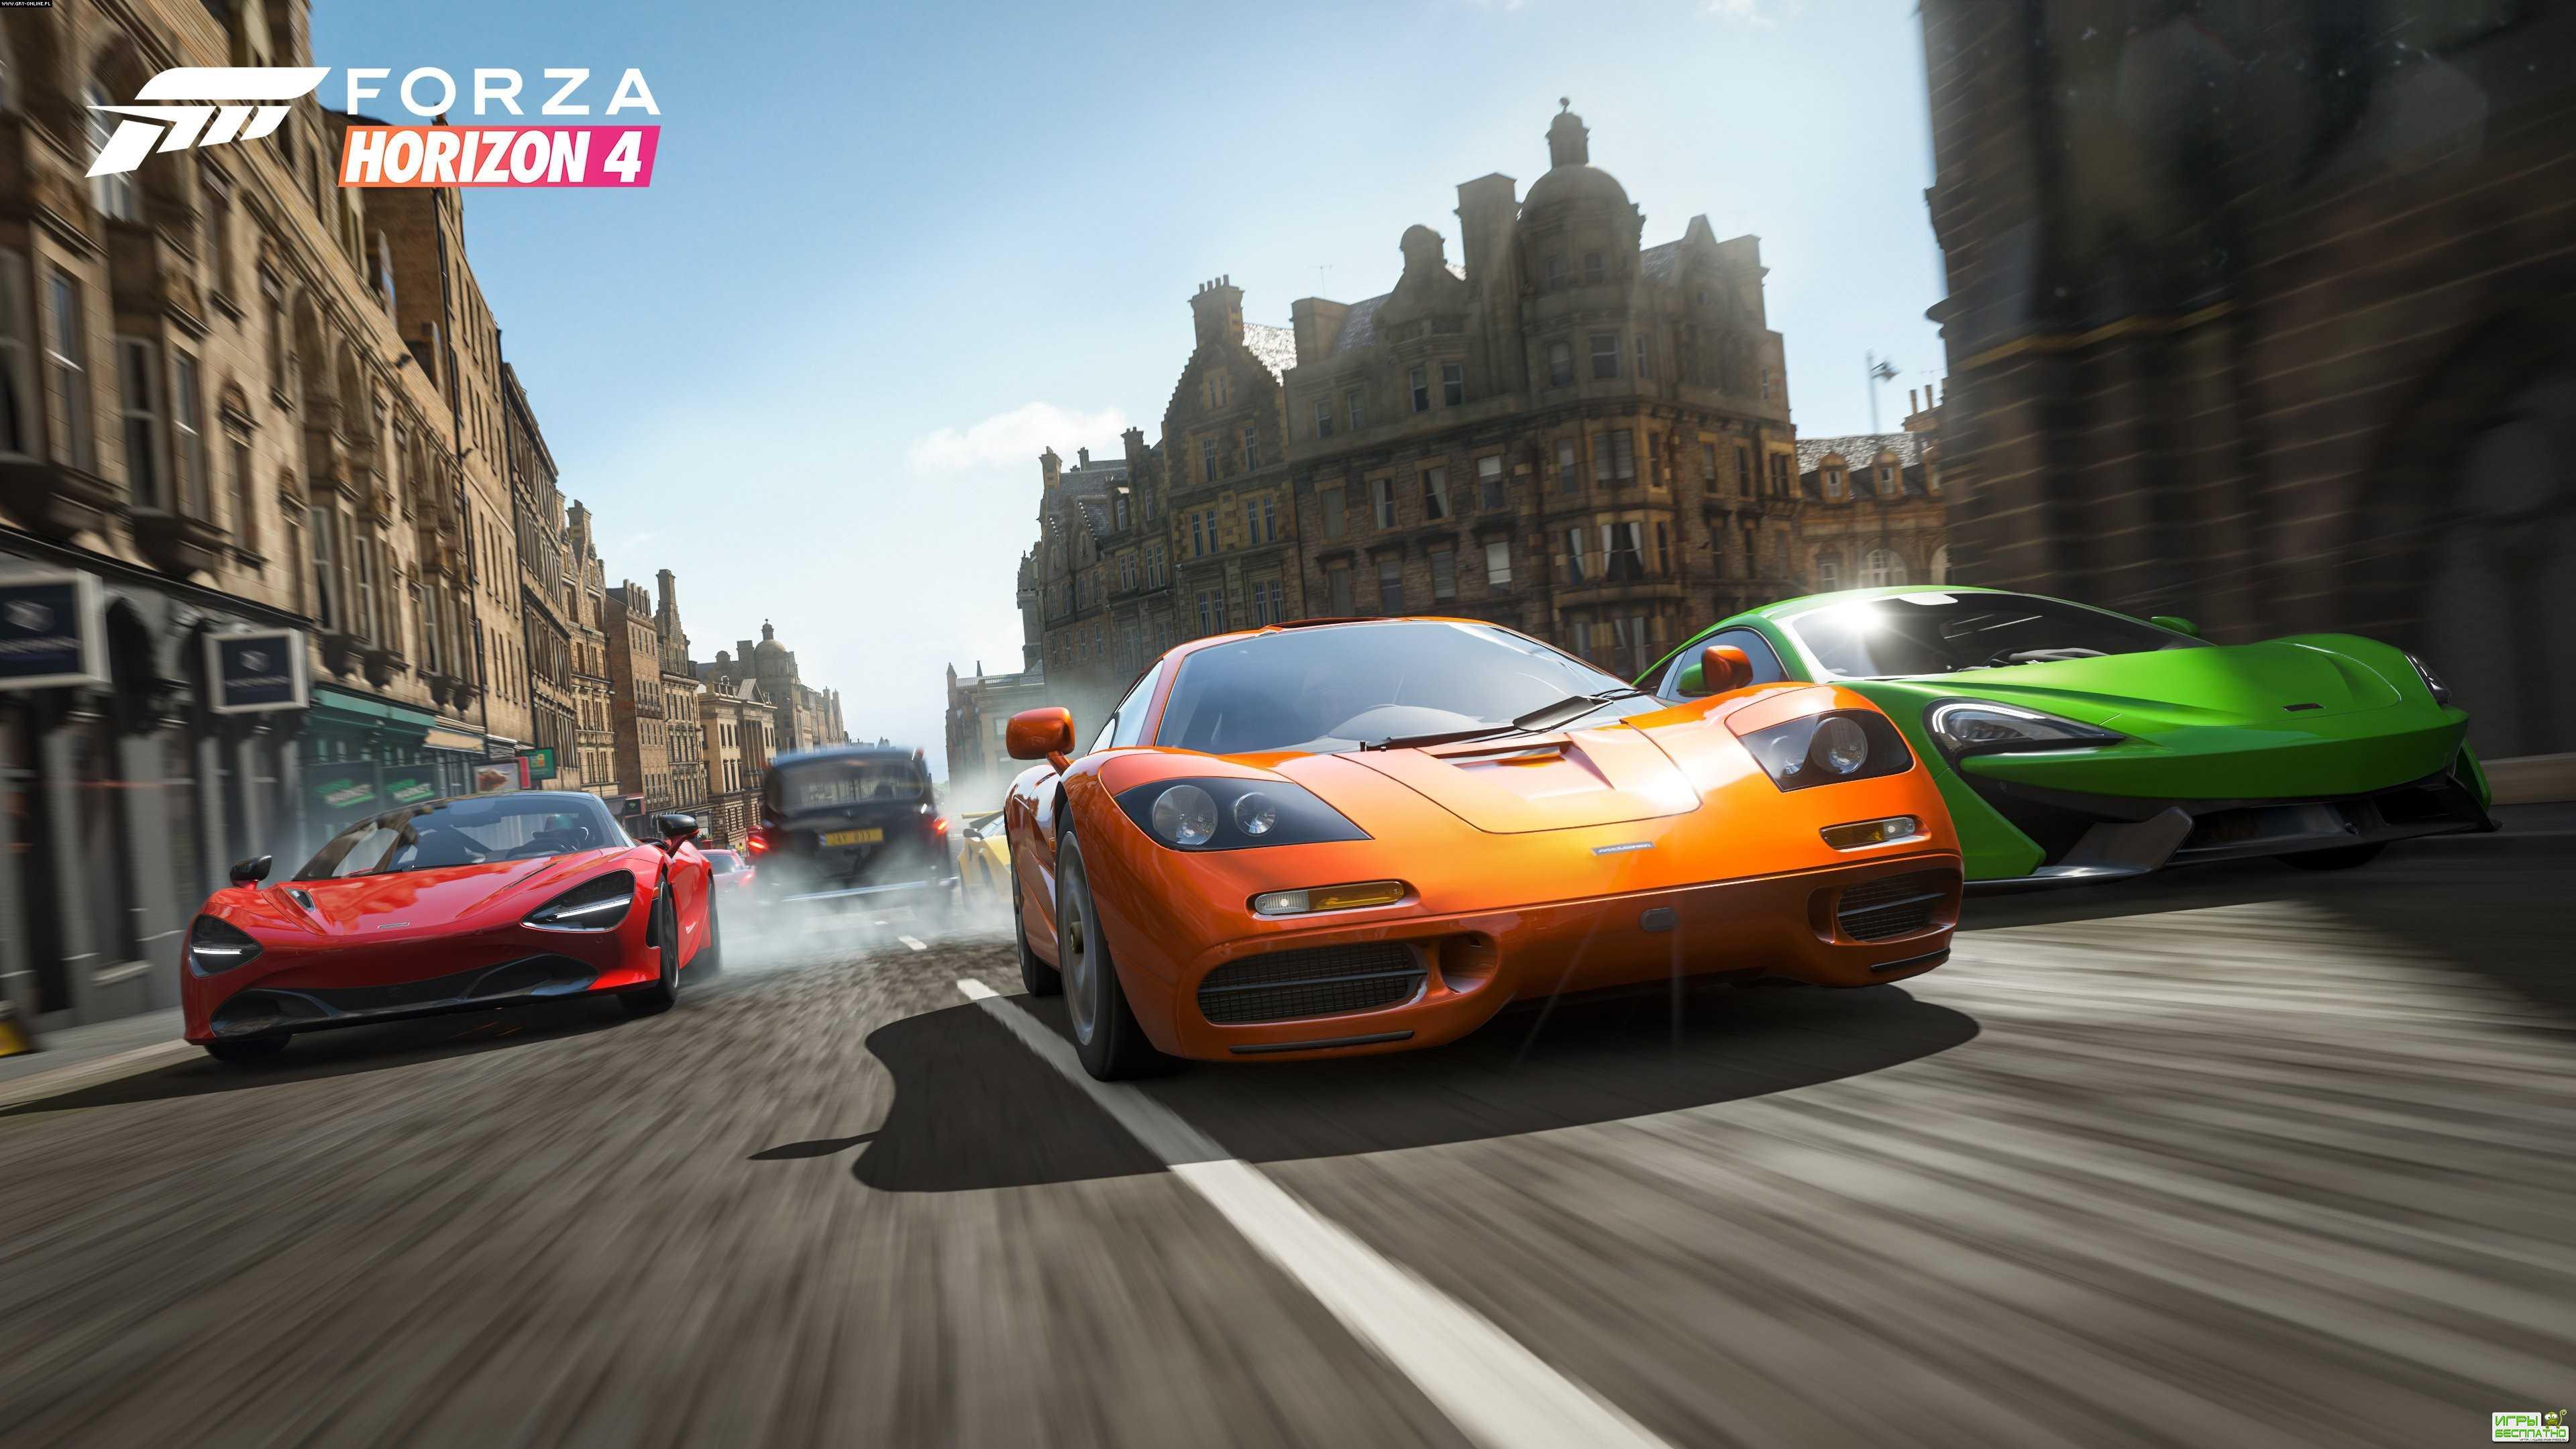 Digital Foundry провели технический анализ Forza Horizon 4